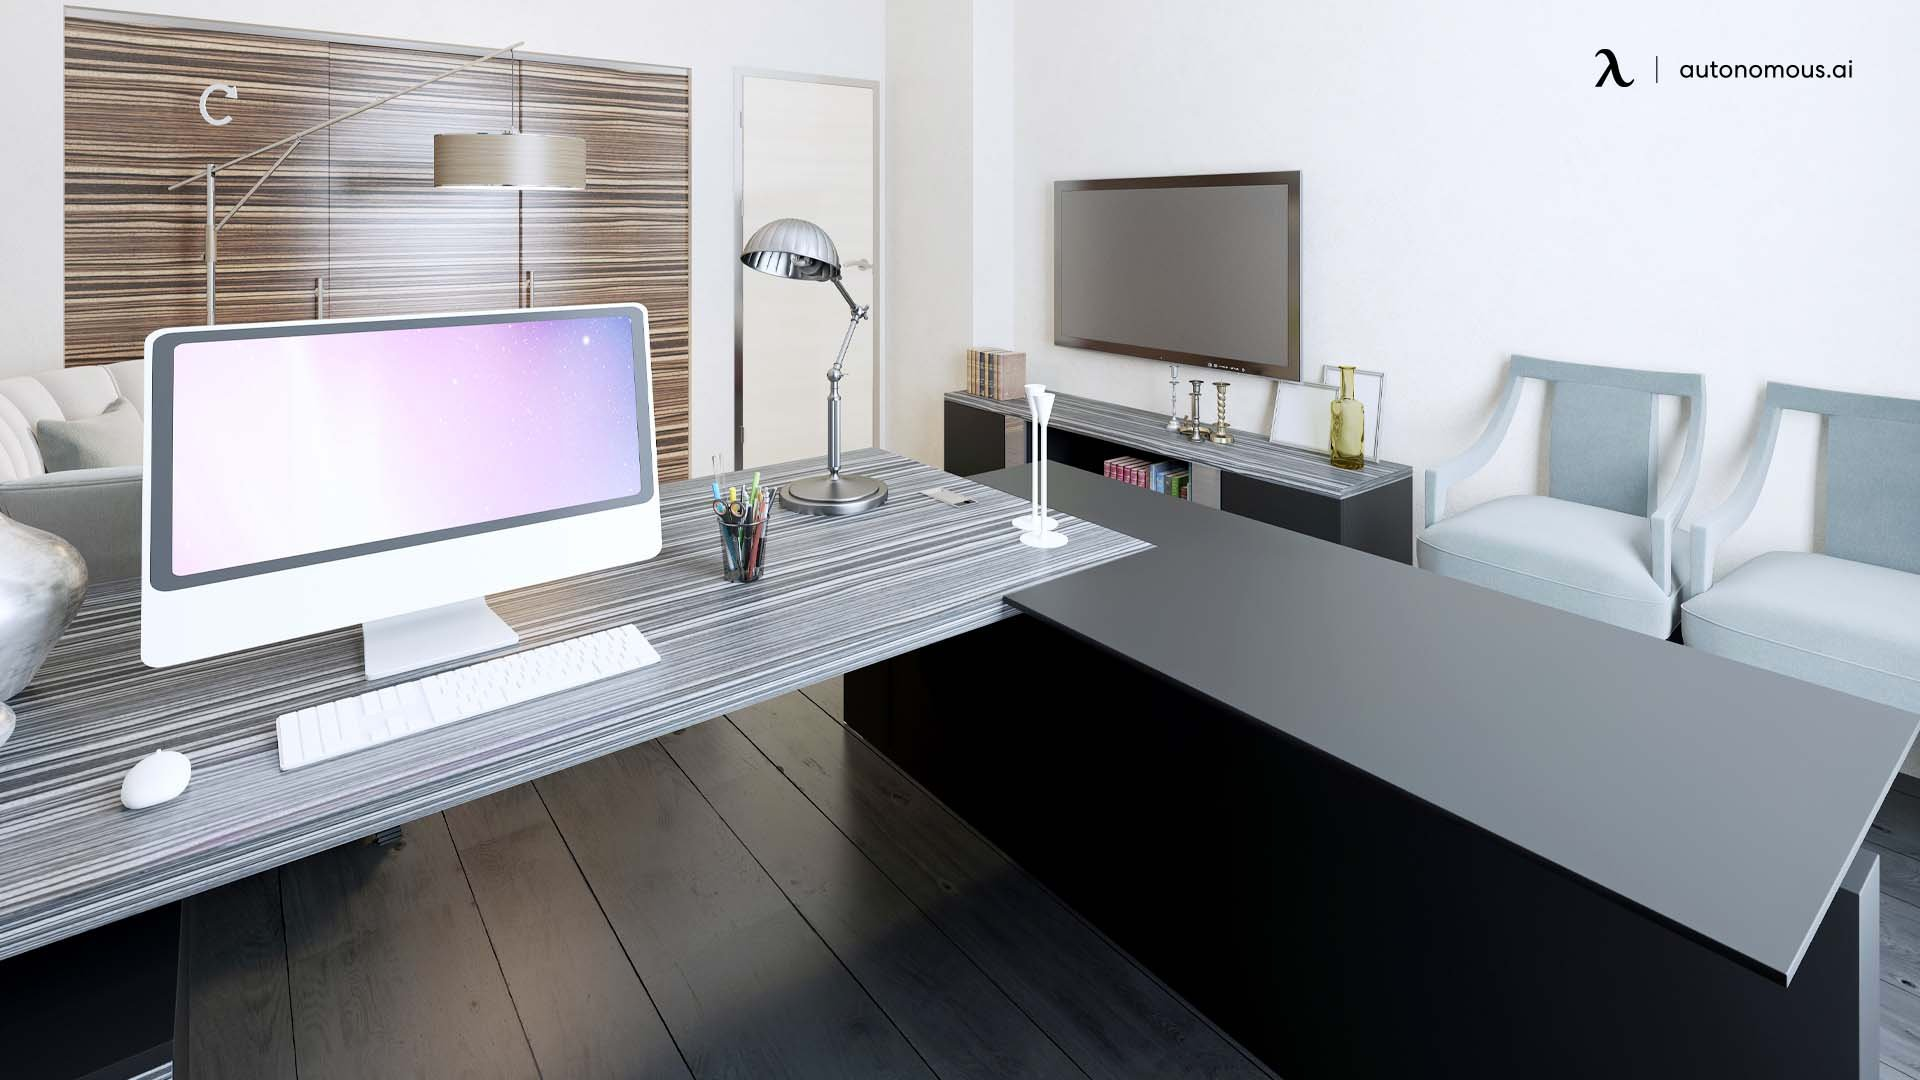 Follow the Minimalist Setup Approach